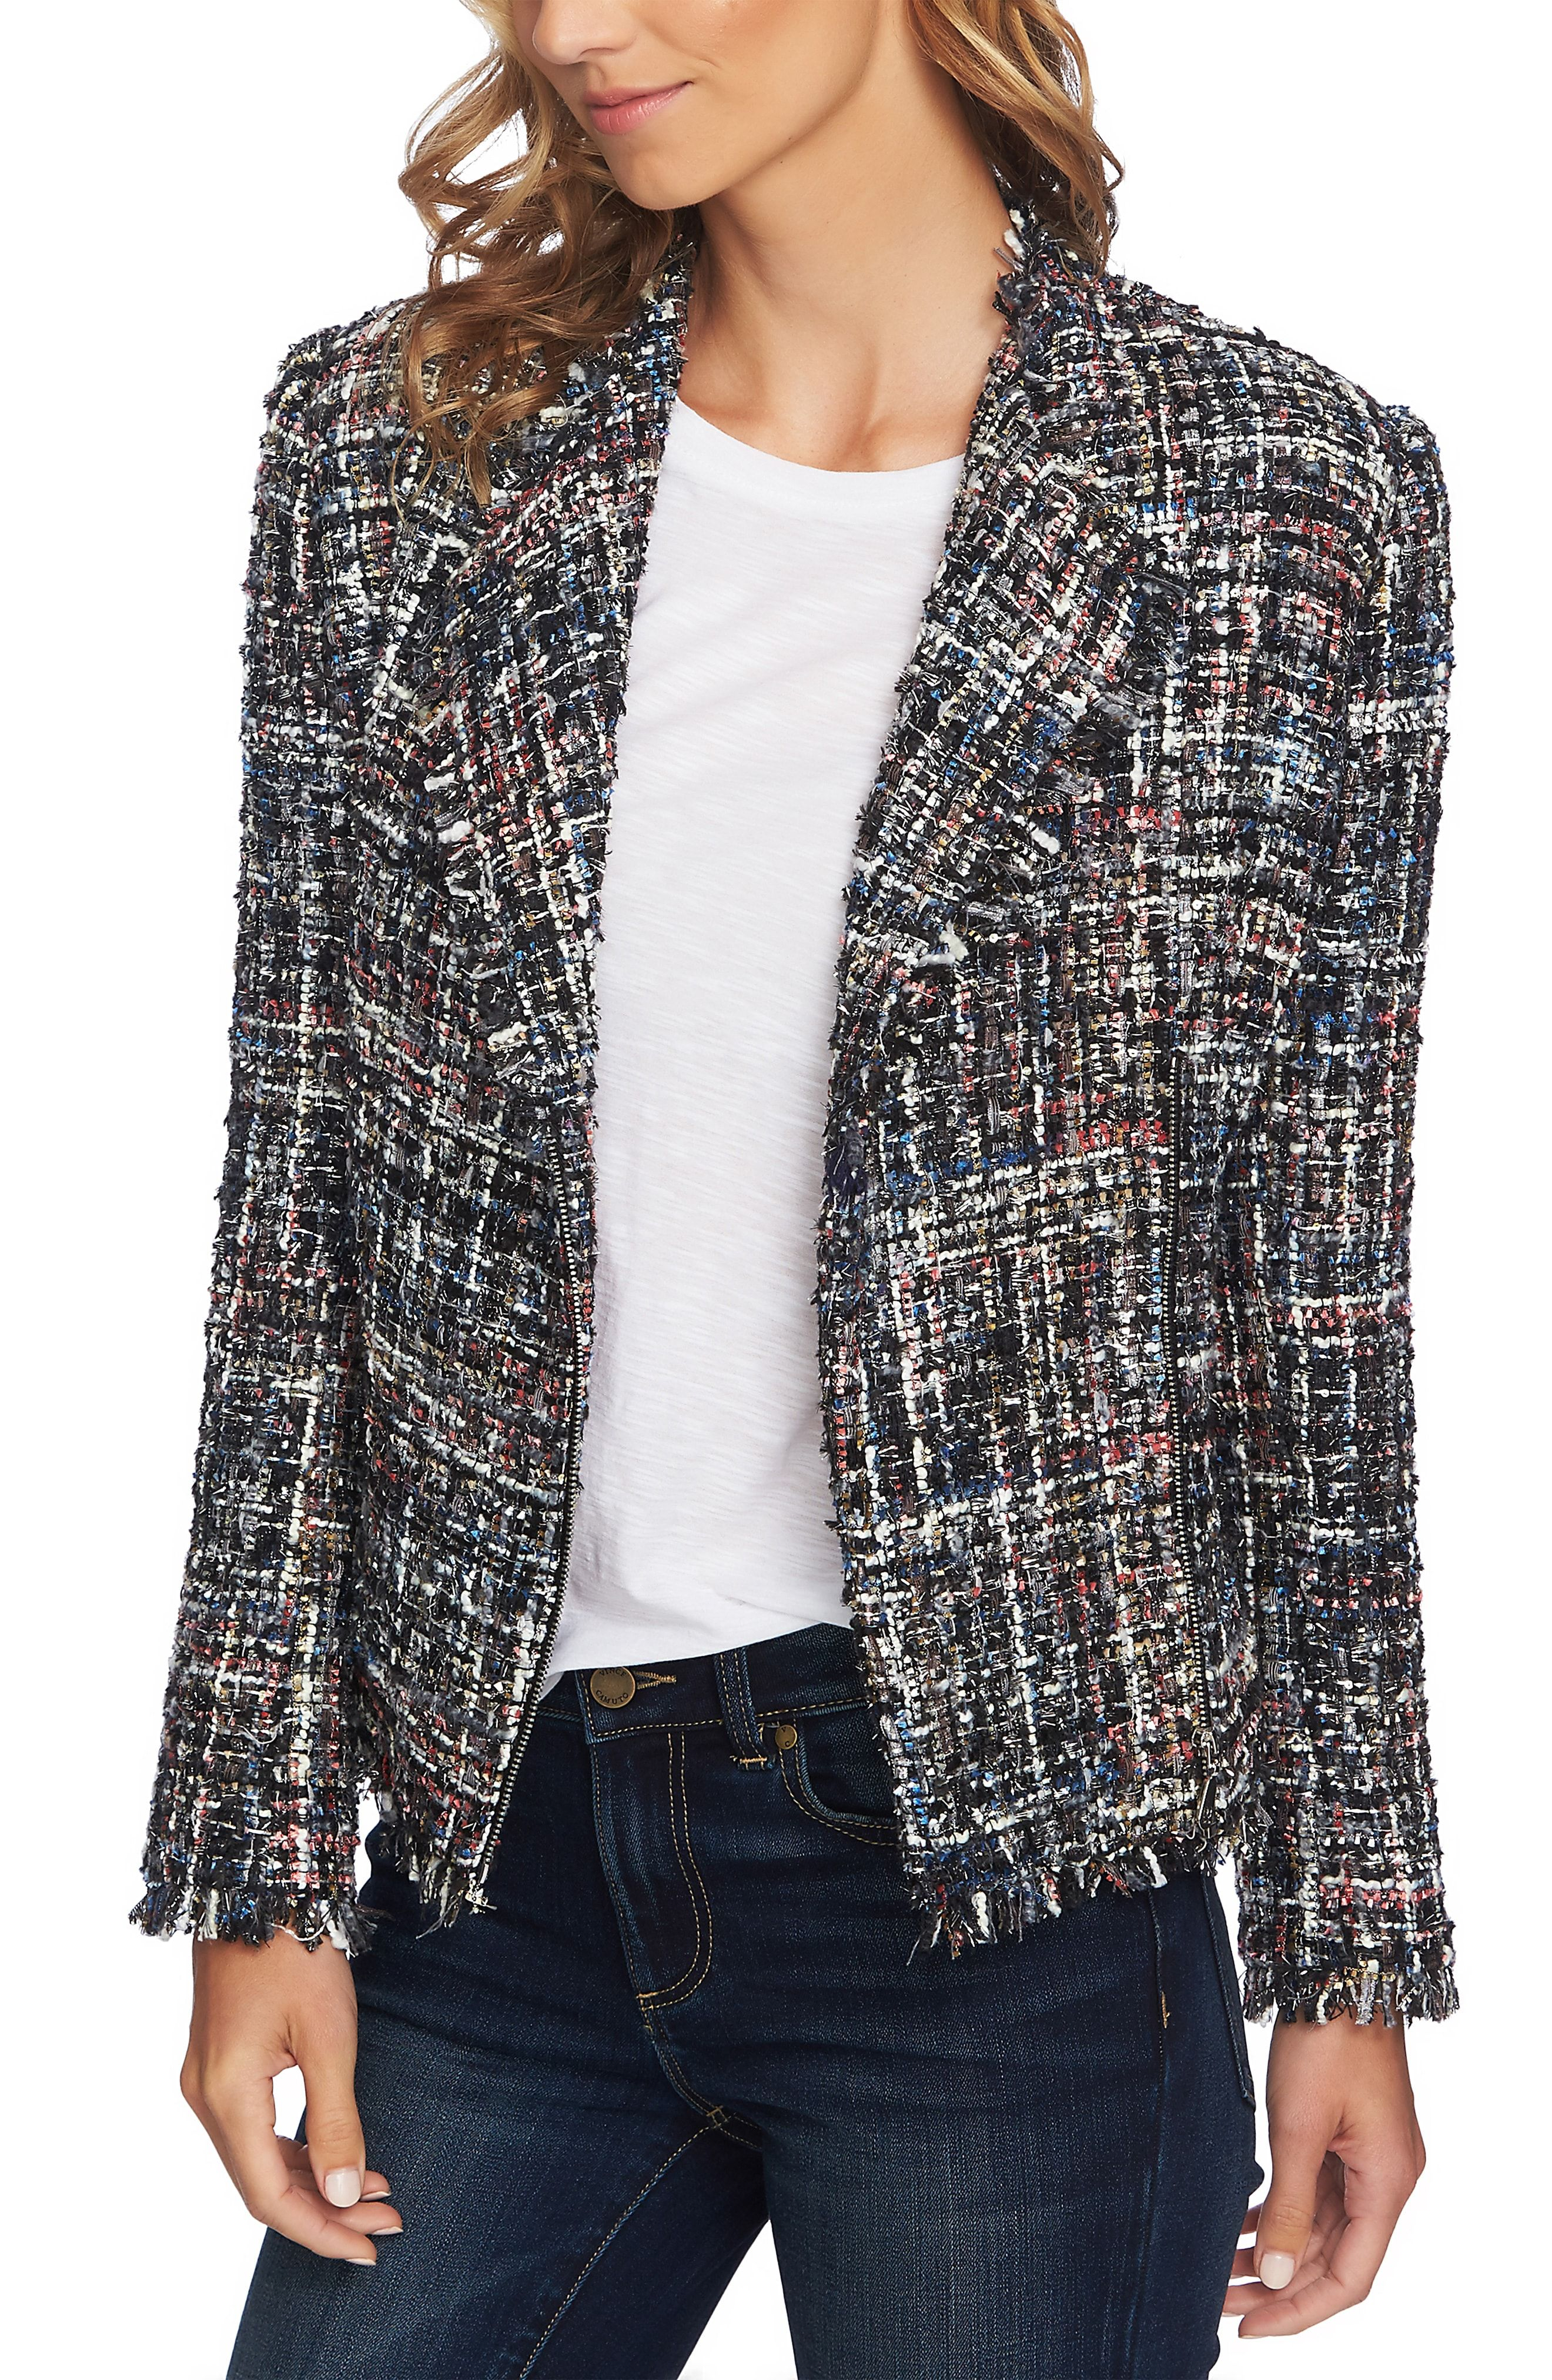 Womens Designer Inspired Pearl Button Tweed  Multi-Color Jacket Coat Blazer